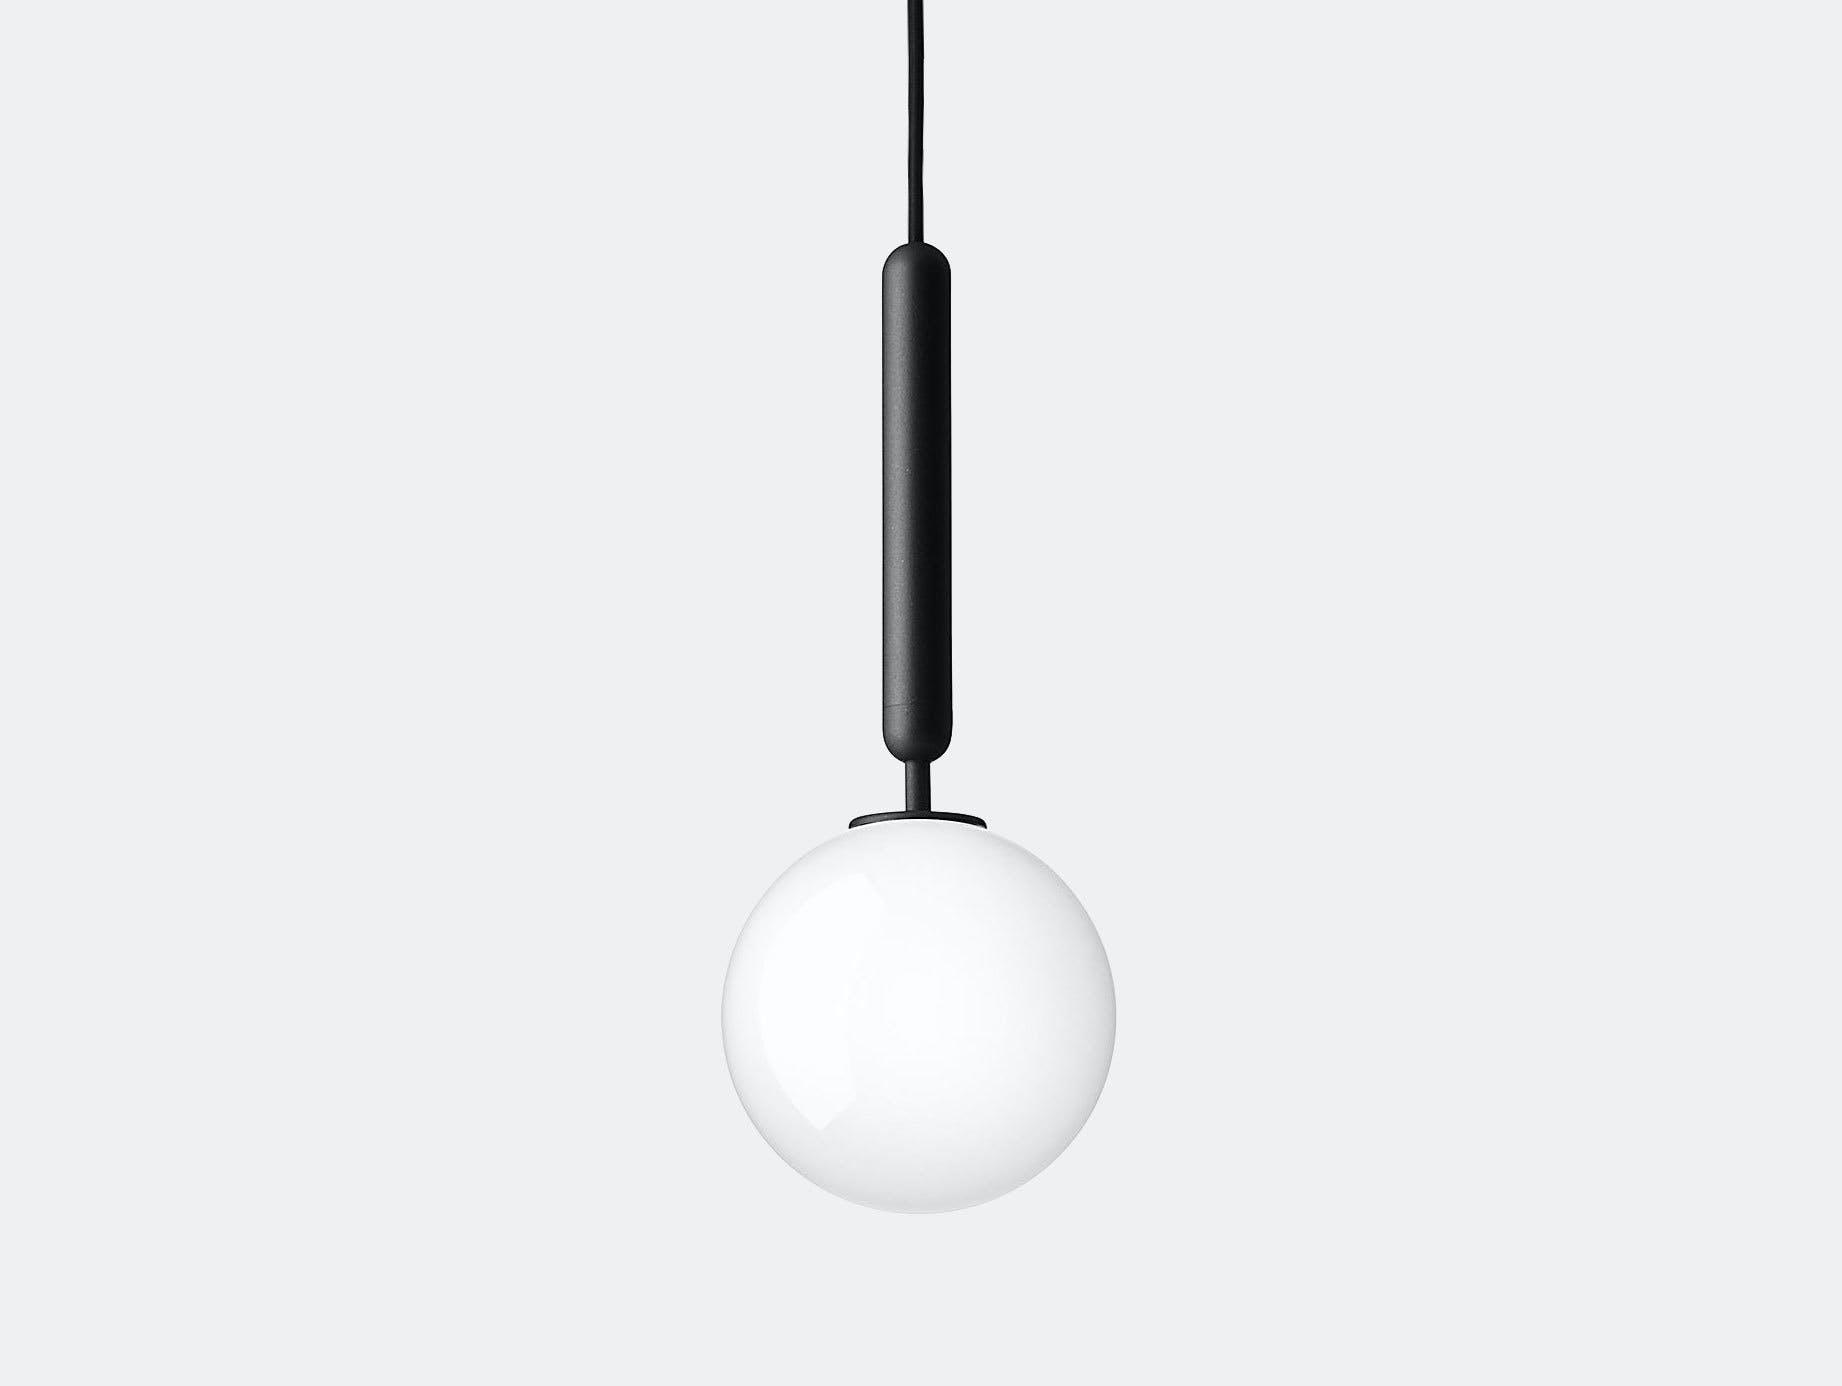 Miira 1 Pendant Light image